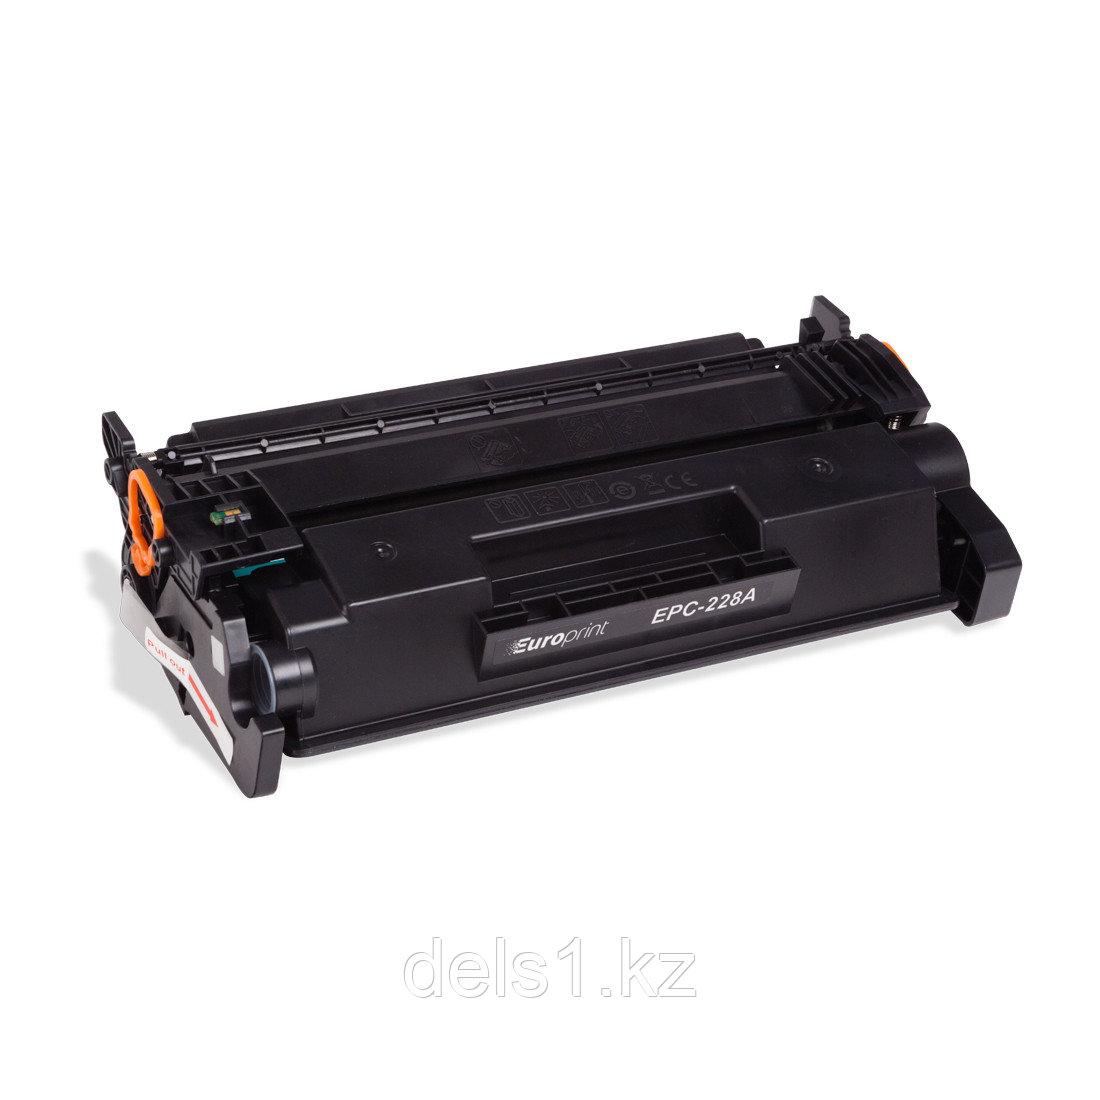 Картридж, Europrint, EPC-228A, Для принтеров HP LaserJet Pro M403, MFP M427, 3000 страниц.